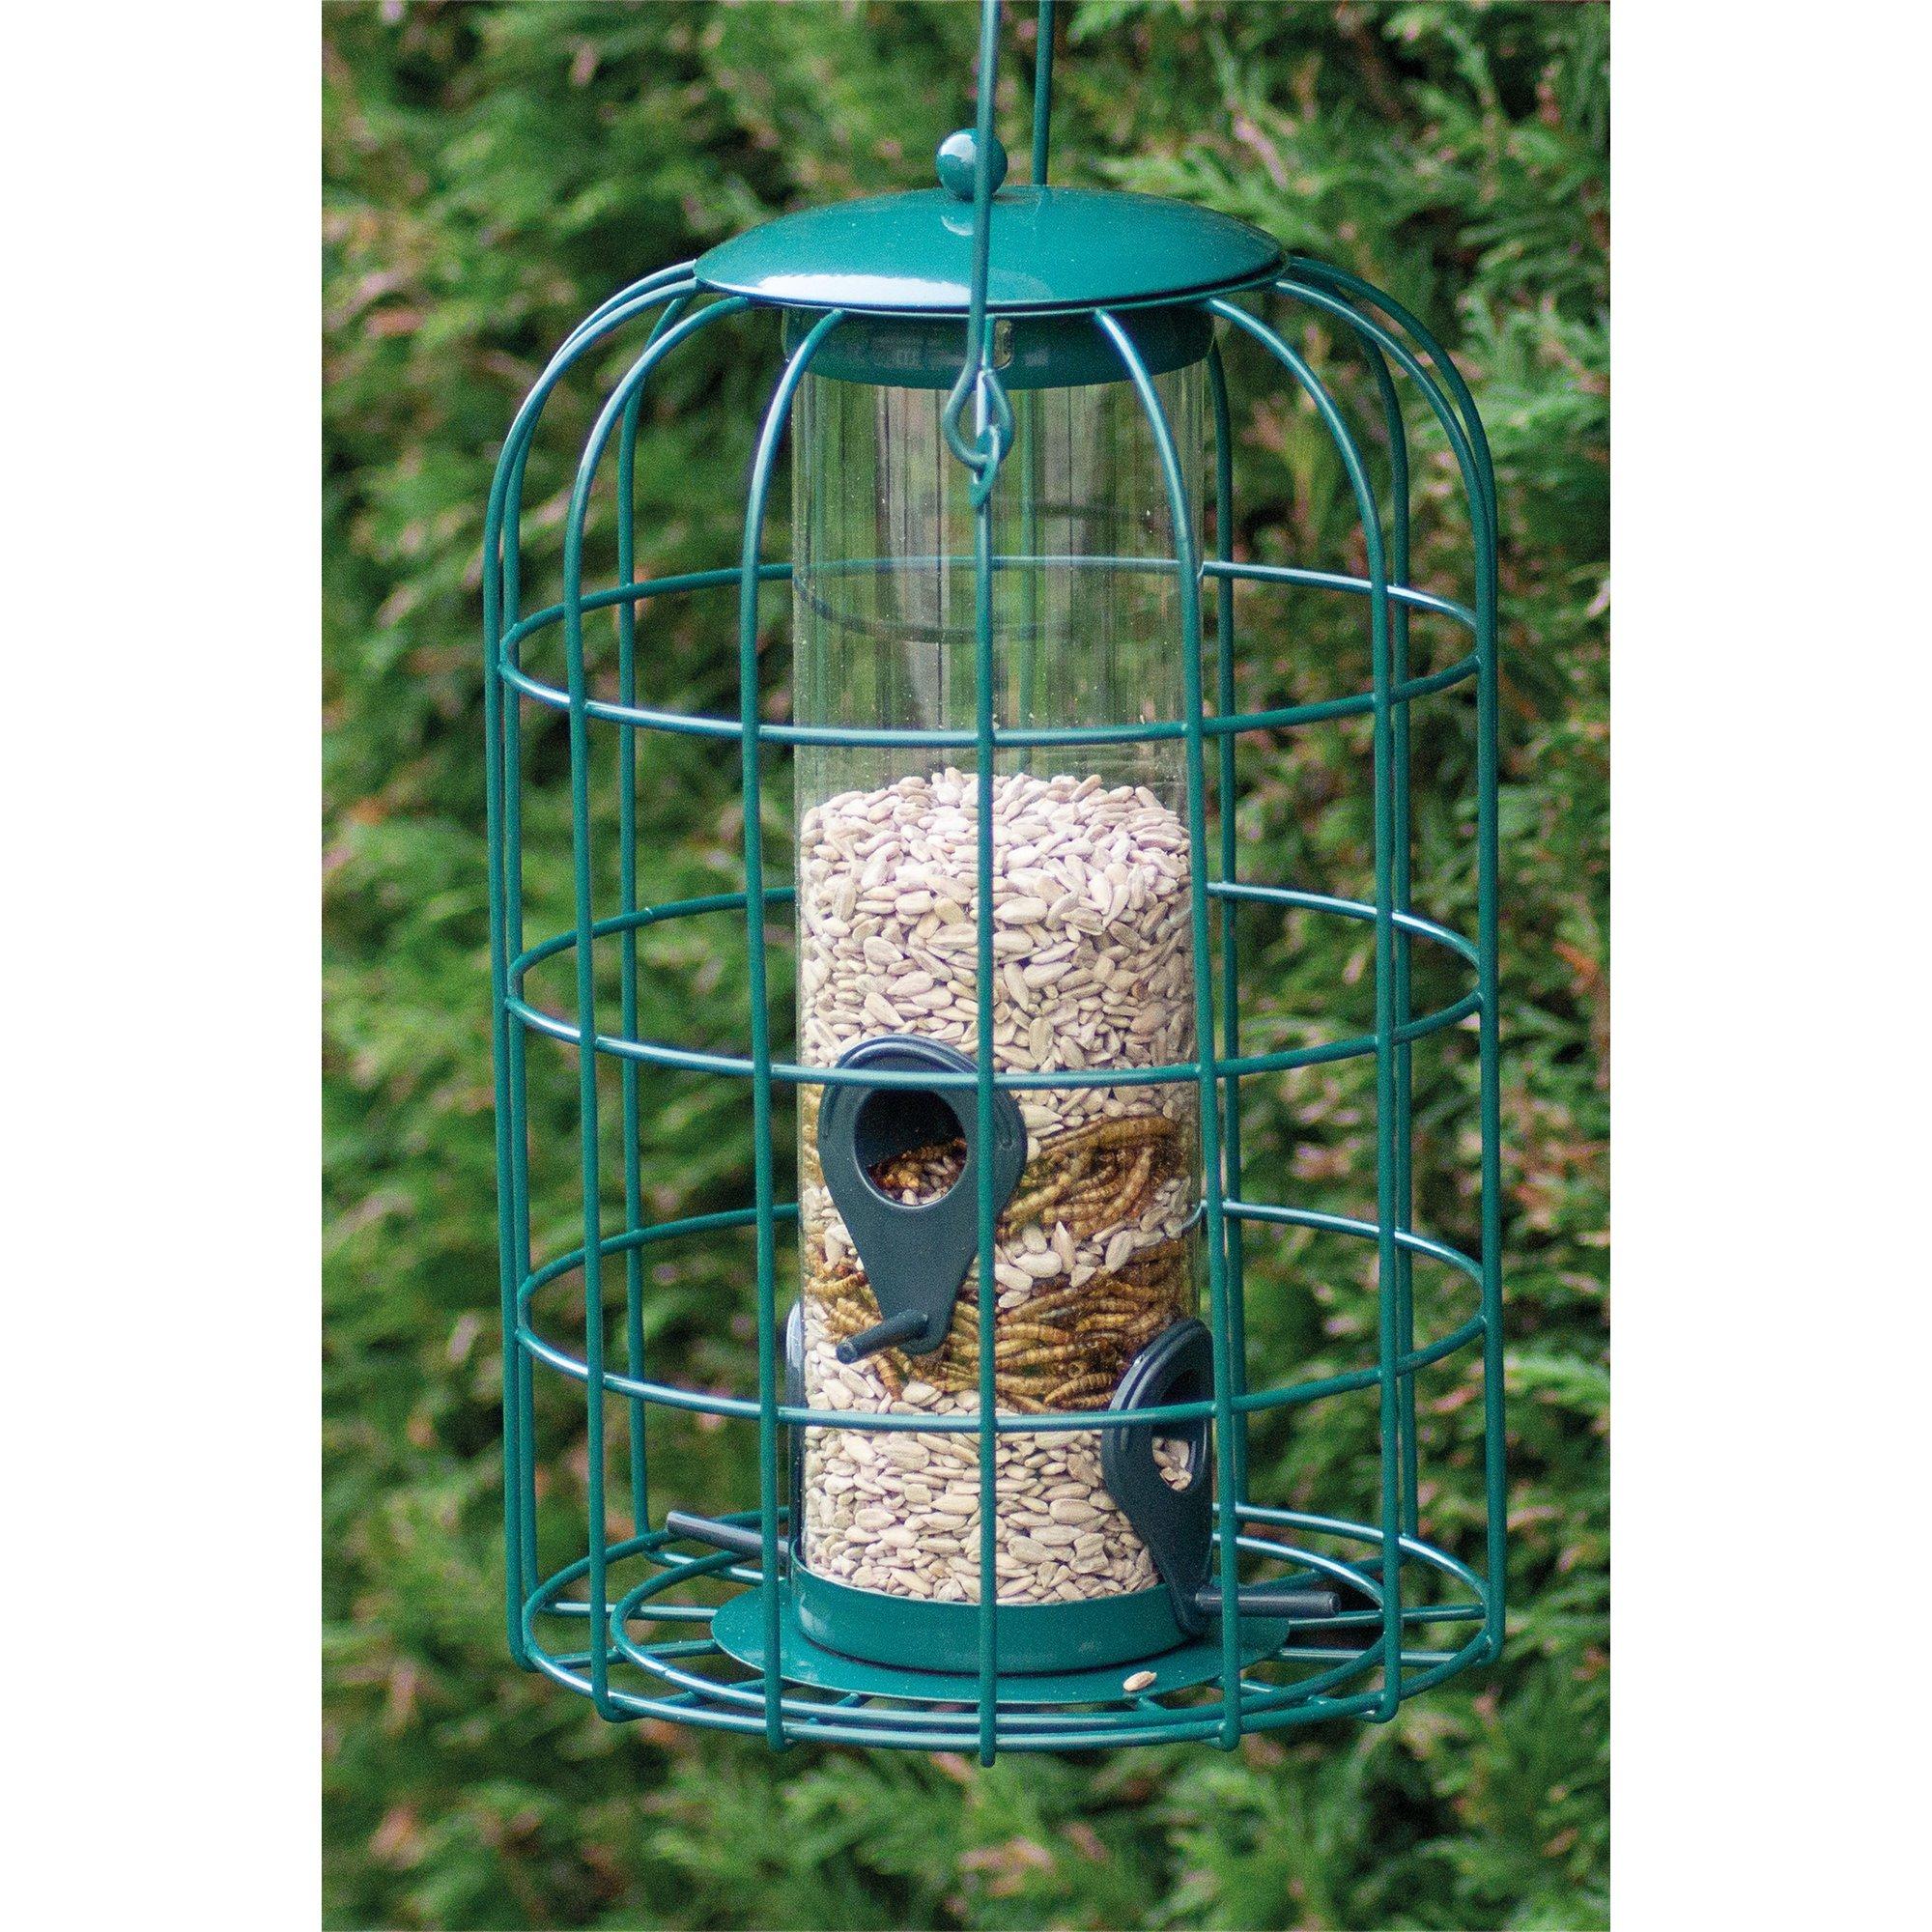 Image of Garden Squirrel Resistant Bird Feeder